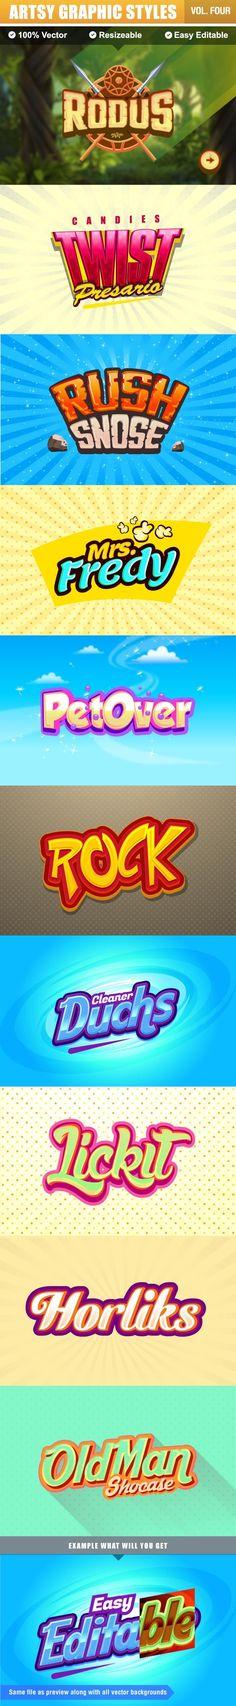 Logo Text Effect for Adobe Illustrator #design #ai Download: http://graphicriver.net/item/logo-text-effect/10821277?ref=ksioks